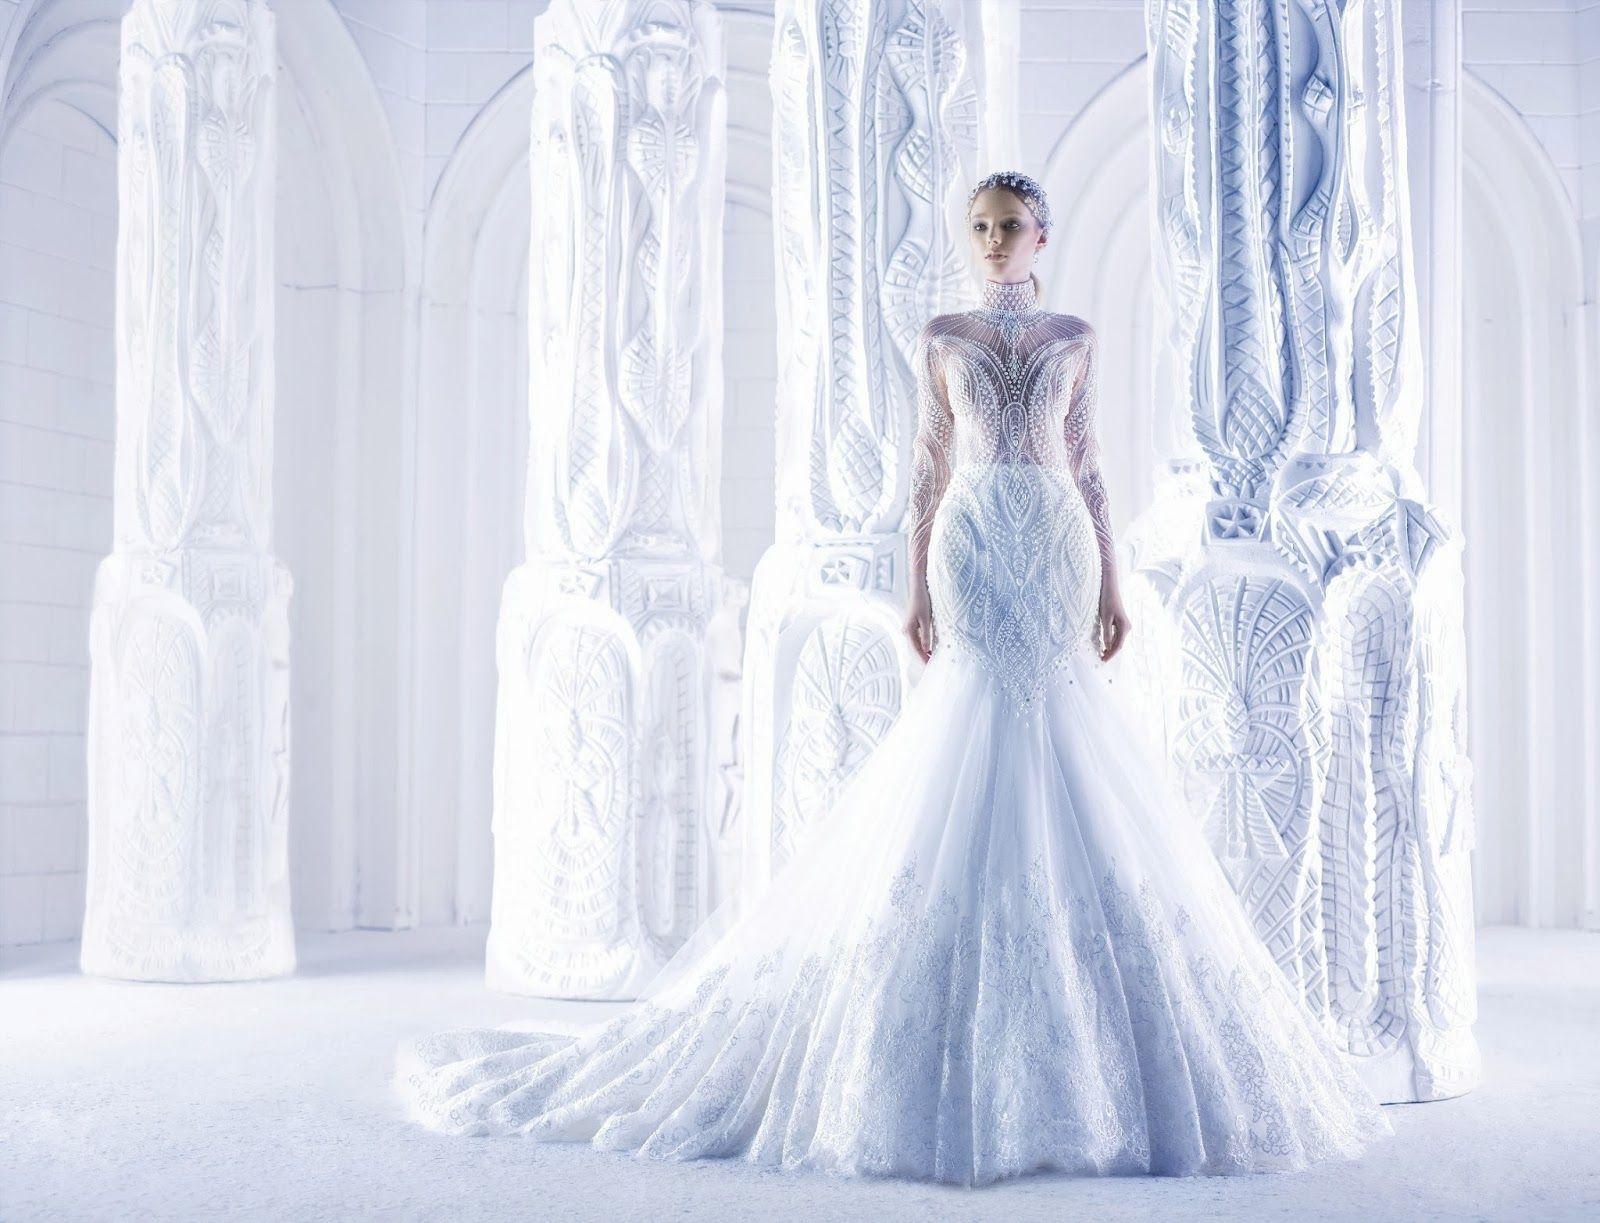 Michael Cinco wedding gown   Wedding Dresses - White   Pinterest ...